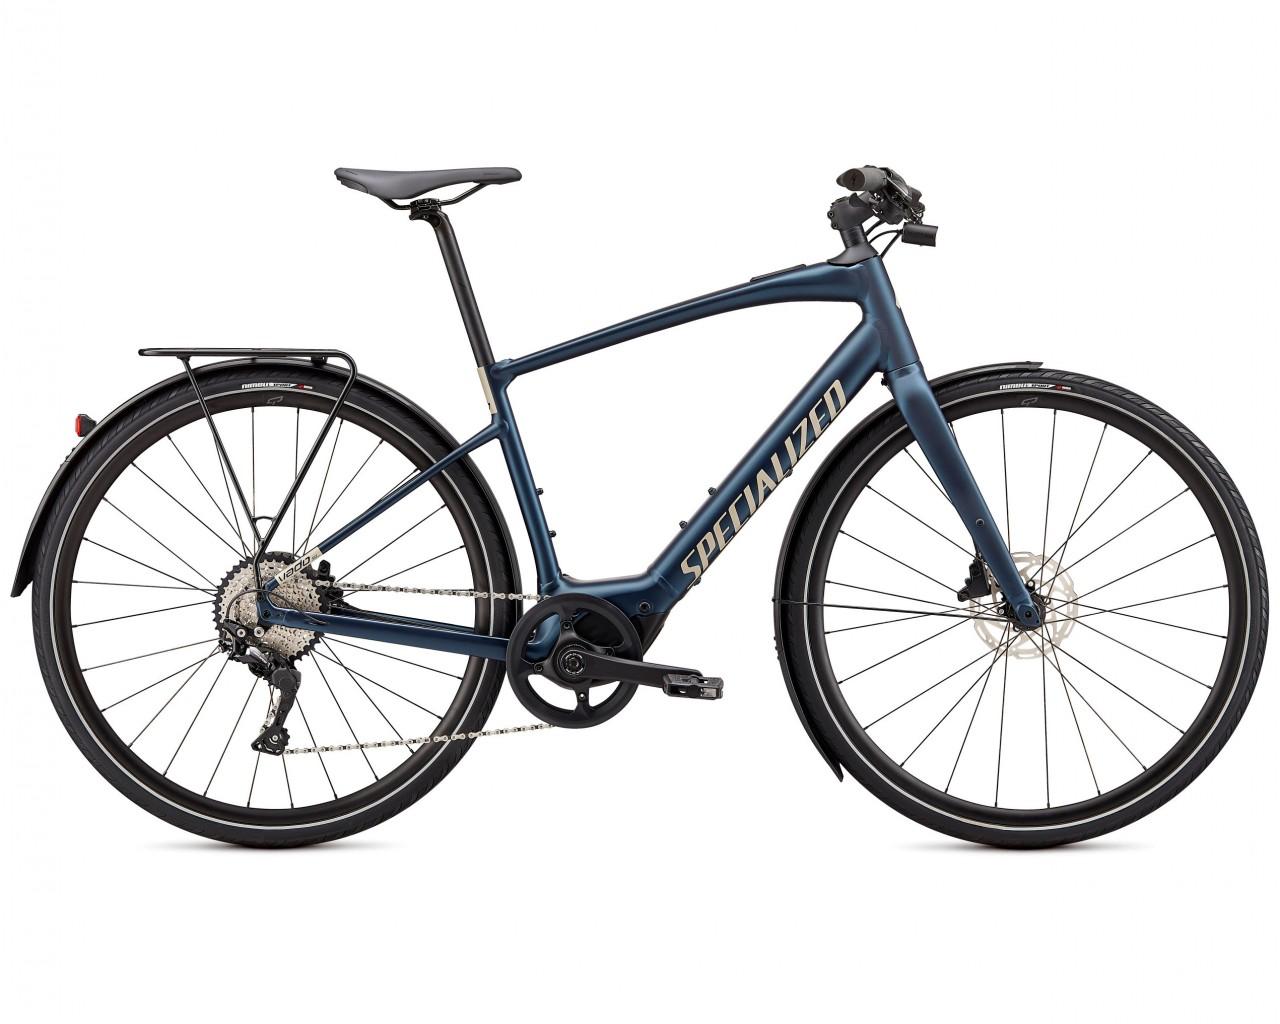 Specialized Vado SL 4.0 EQ - Elektro Trekking Bike 2021 | navy-white mountains reflective